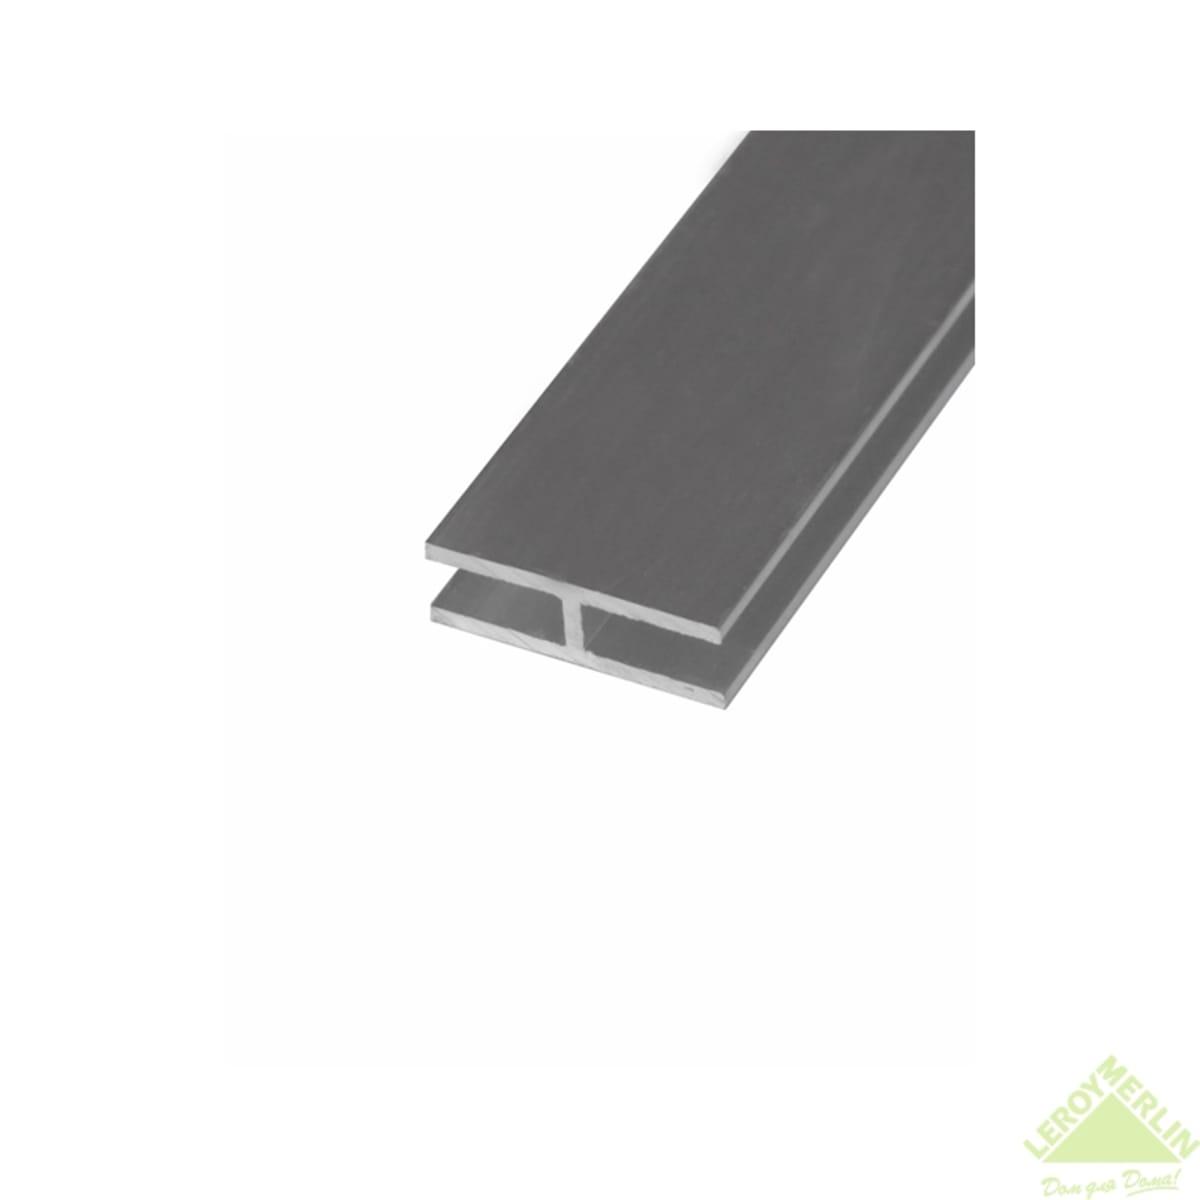 Двутавр алюминиевый 30х20х30х1.5 мм, 2 м, цвет серебро